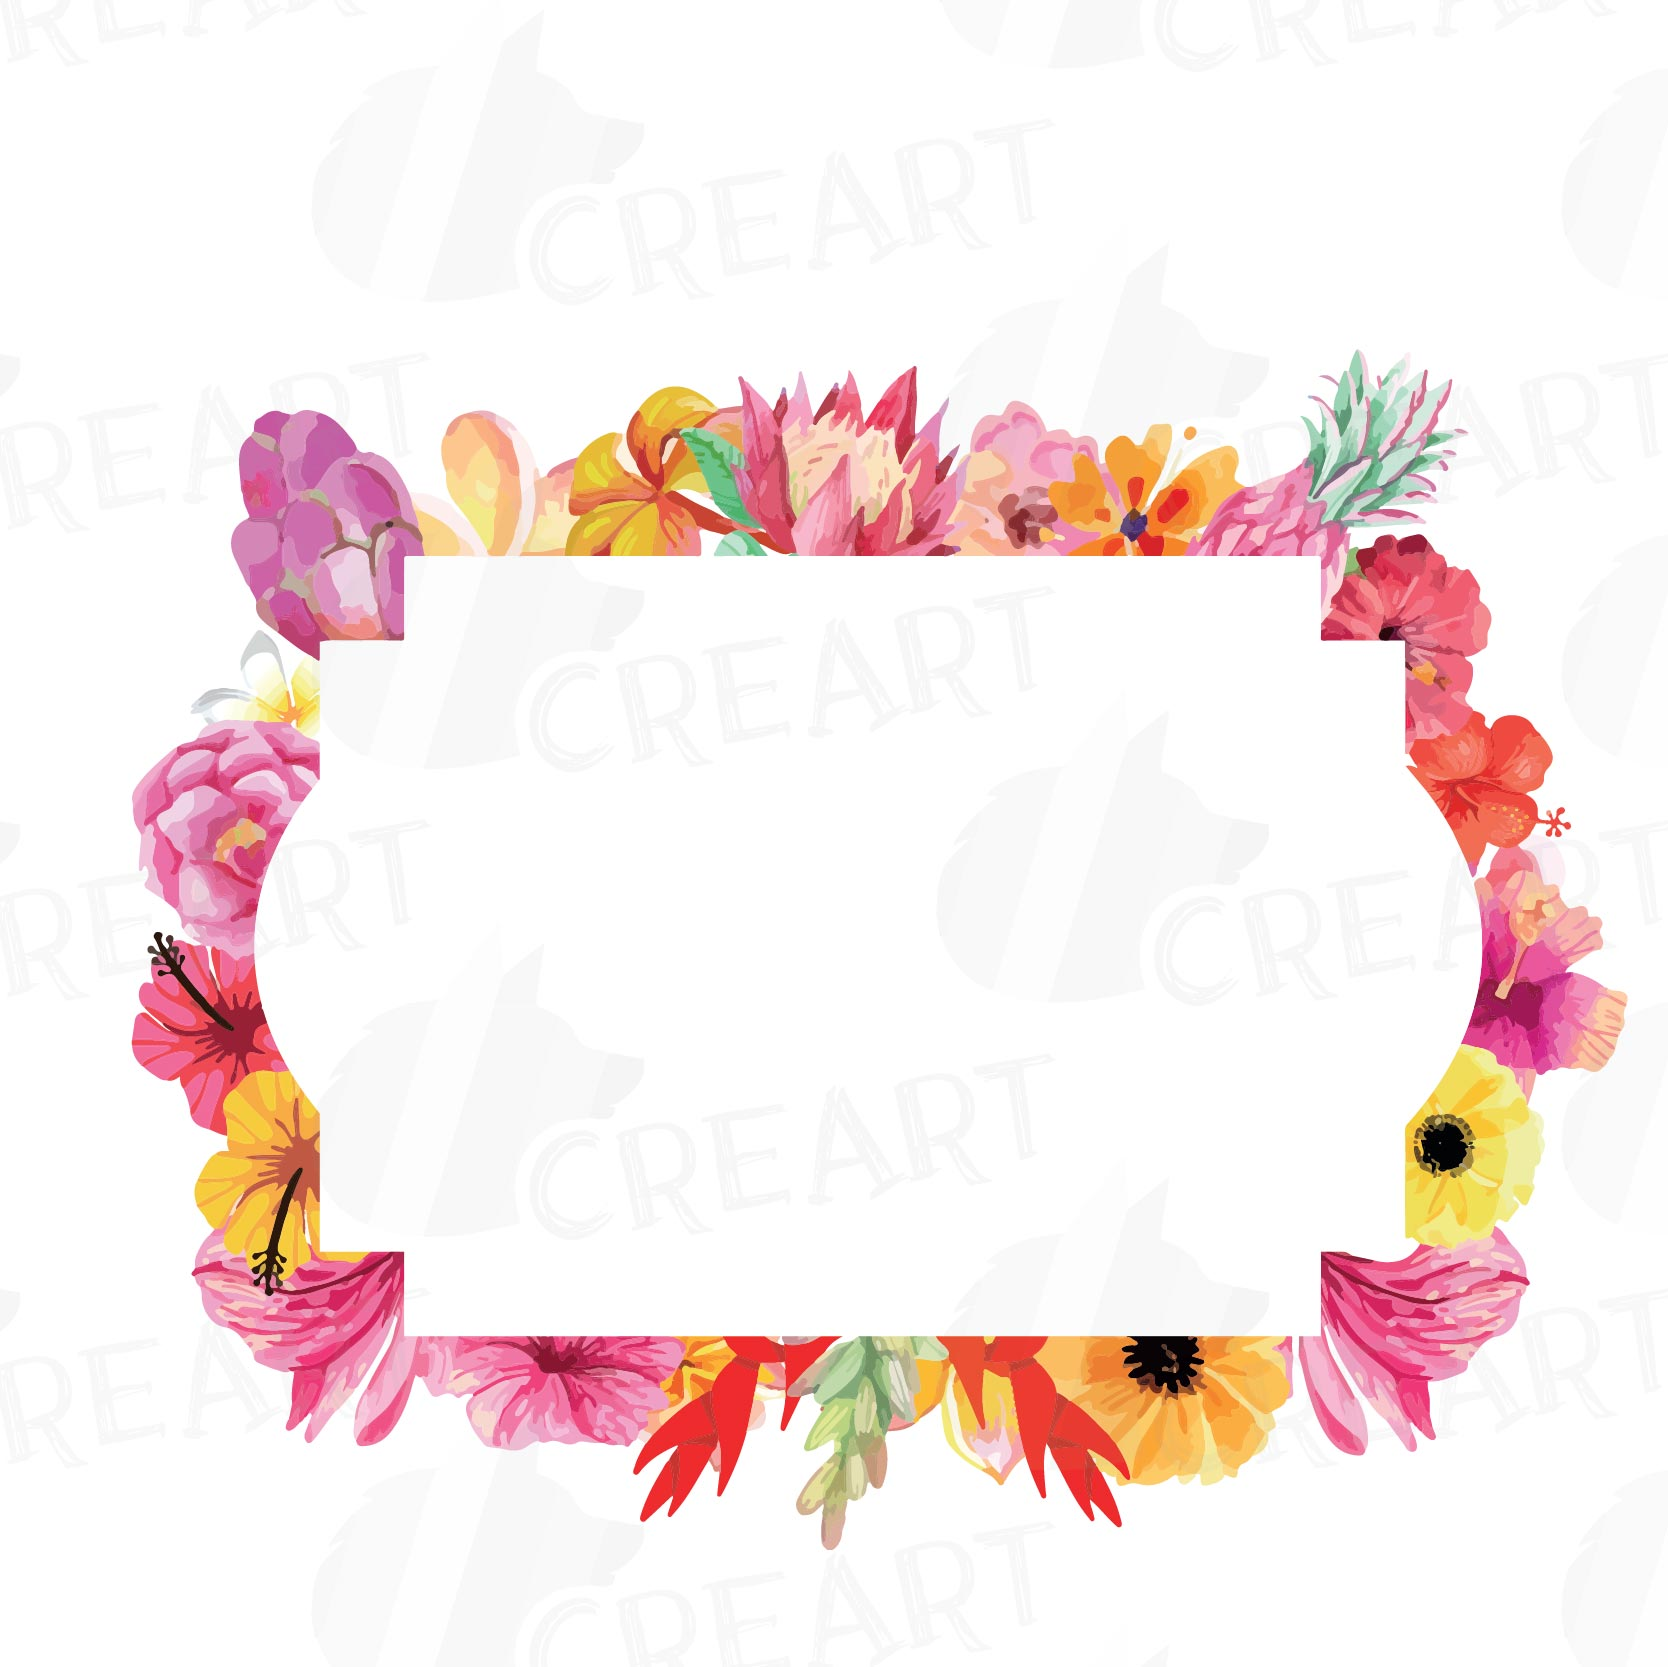 Modern floral frames sketch picture frame ideas stillhouseplants floral frames watercolor clip art colle design bundles mightylinksfo